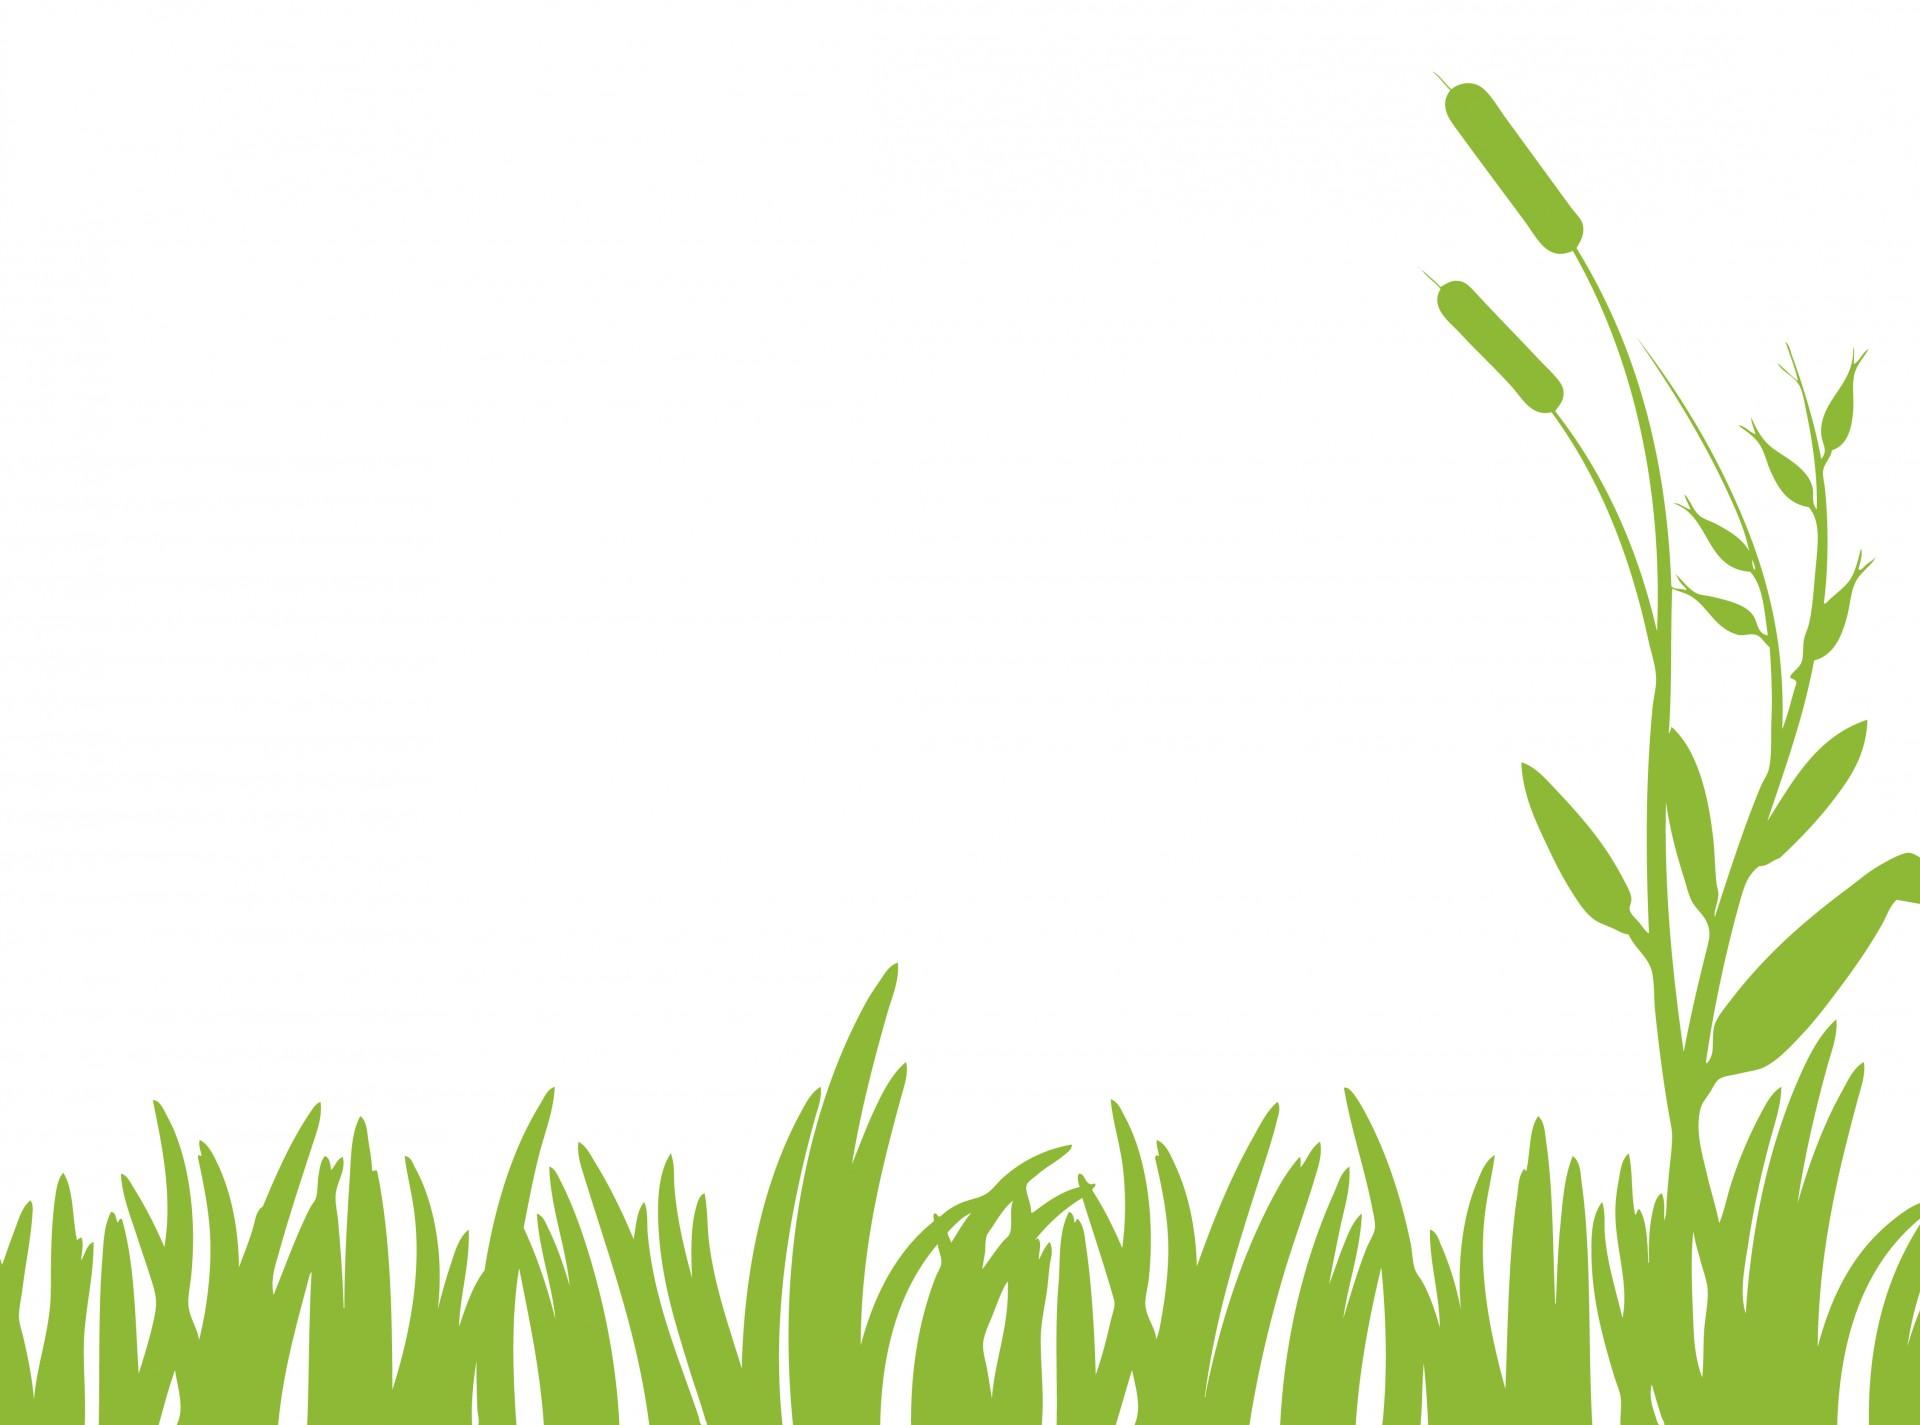 Clipart grass jpeg. Green free stock photo